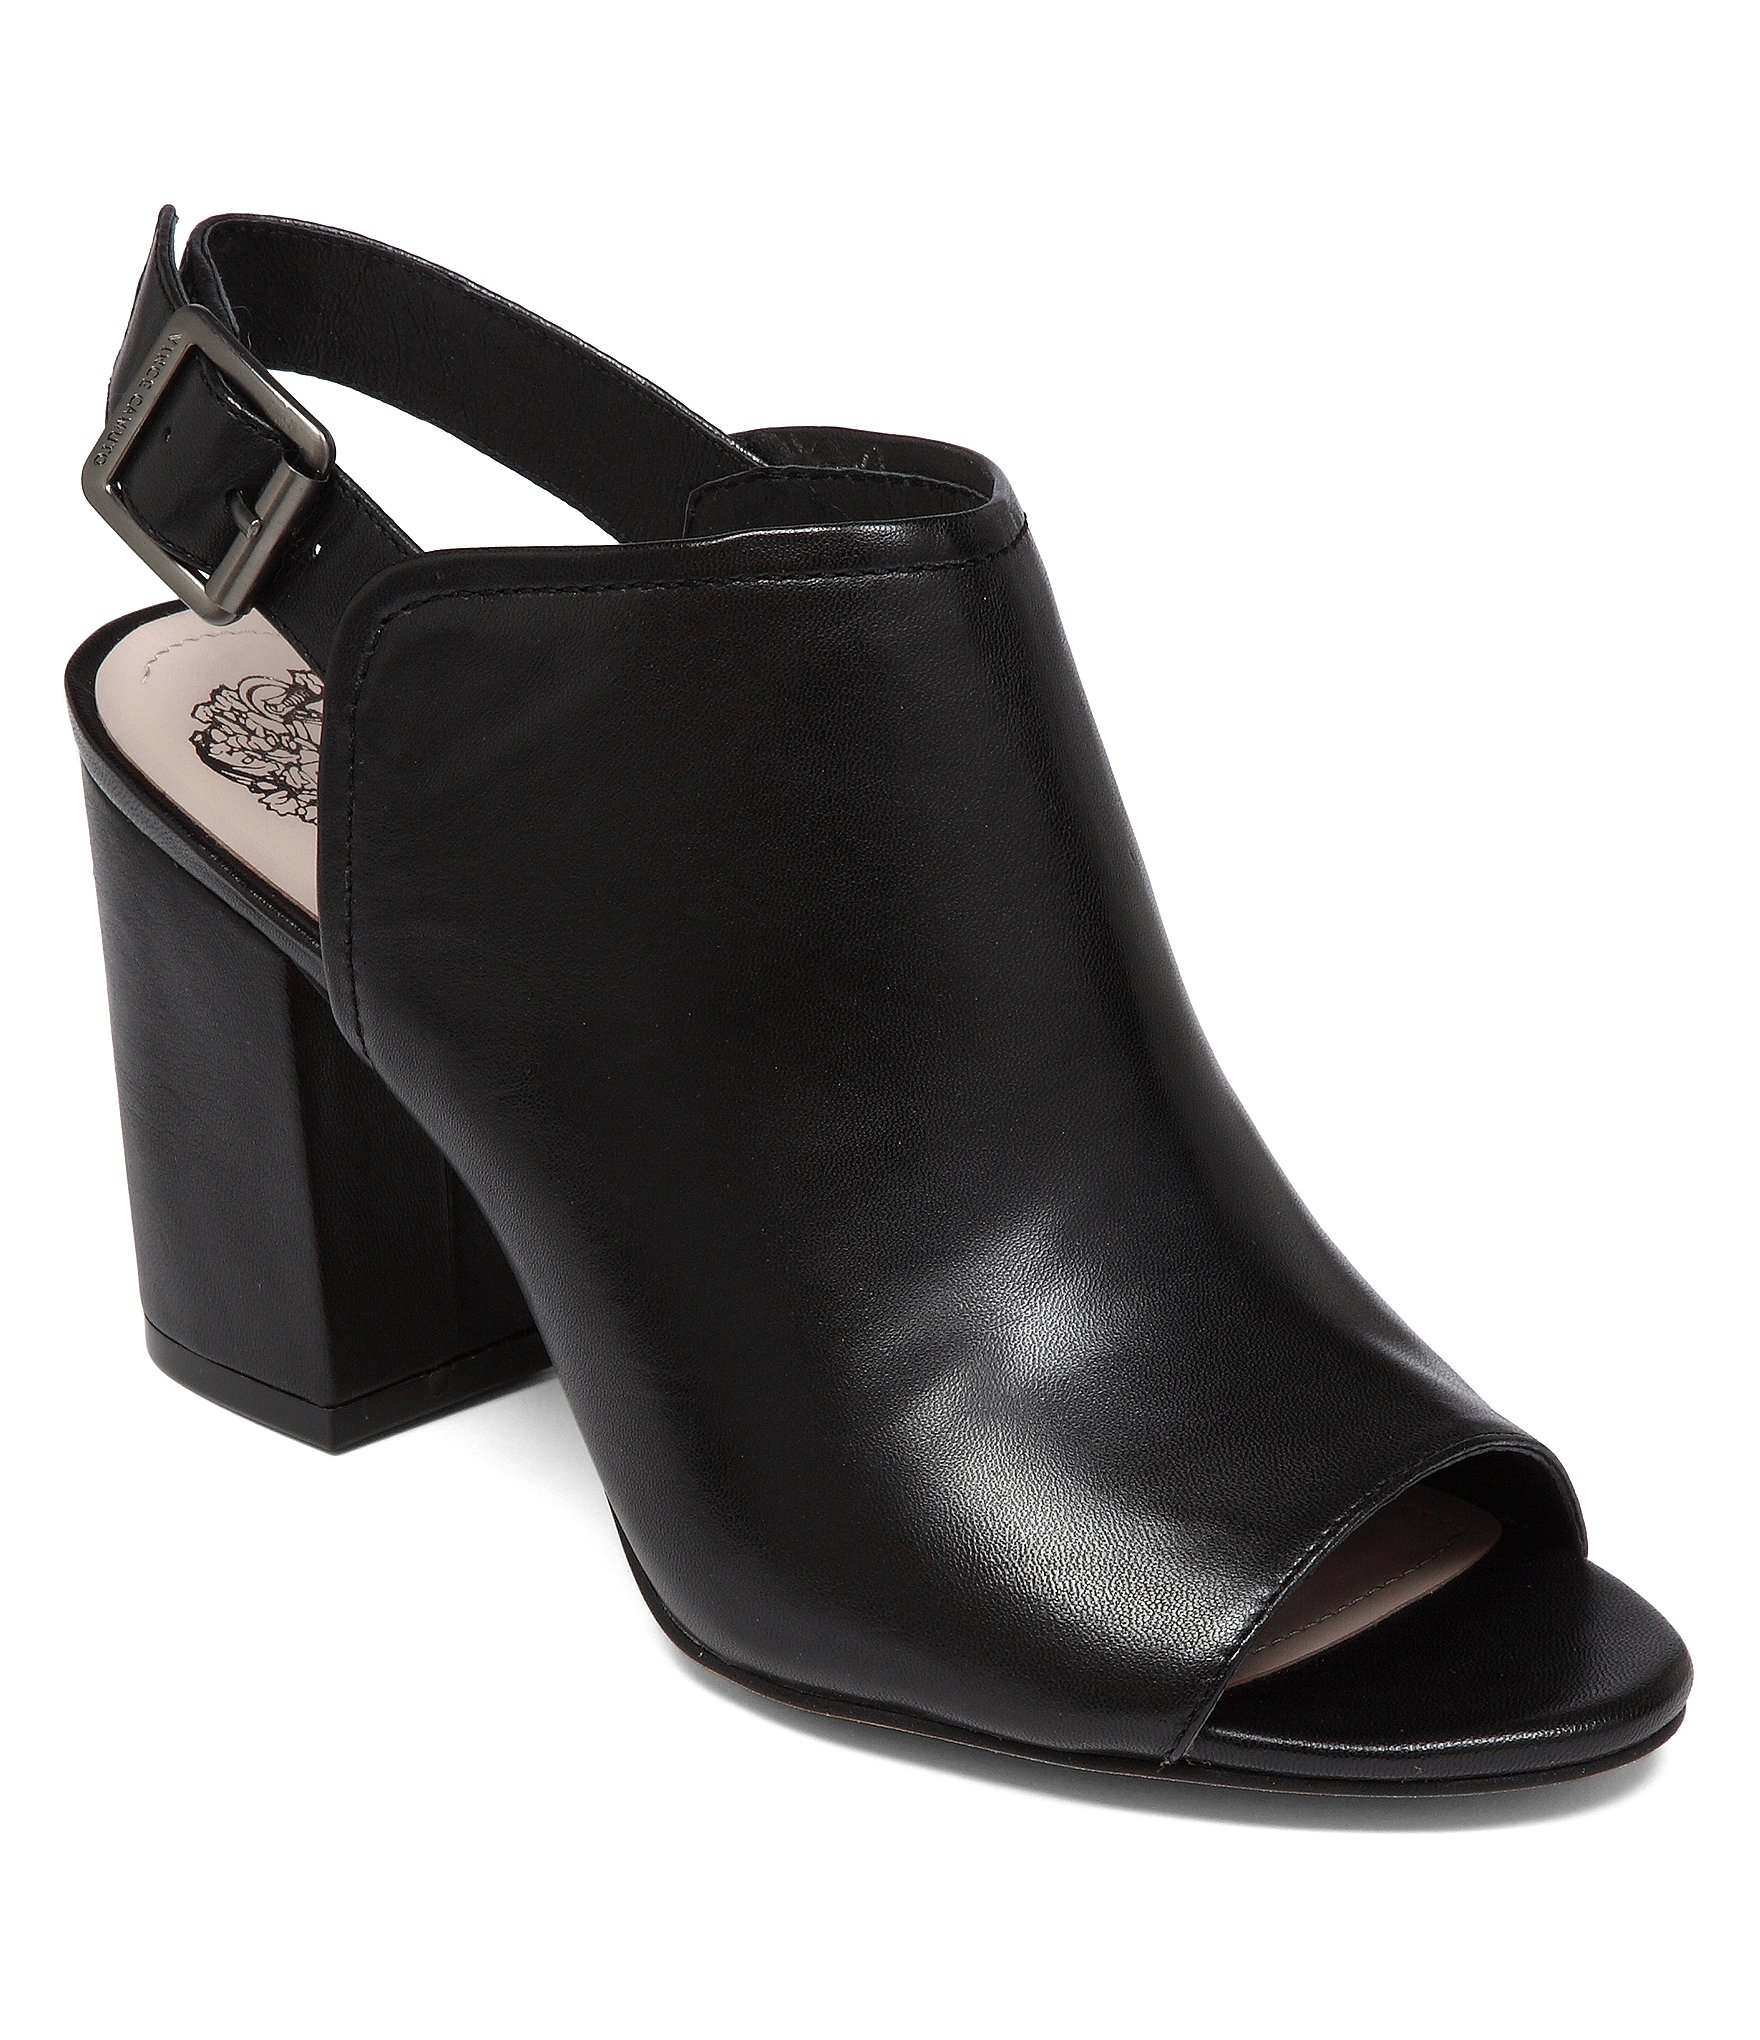 Vince Camuto High Heel Shoe